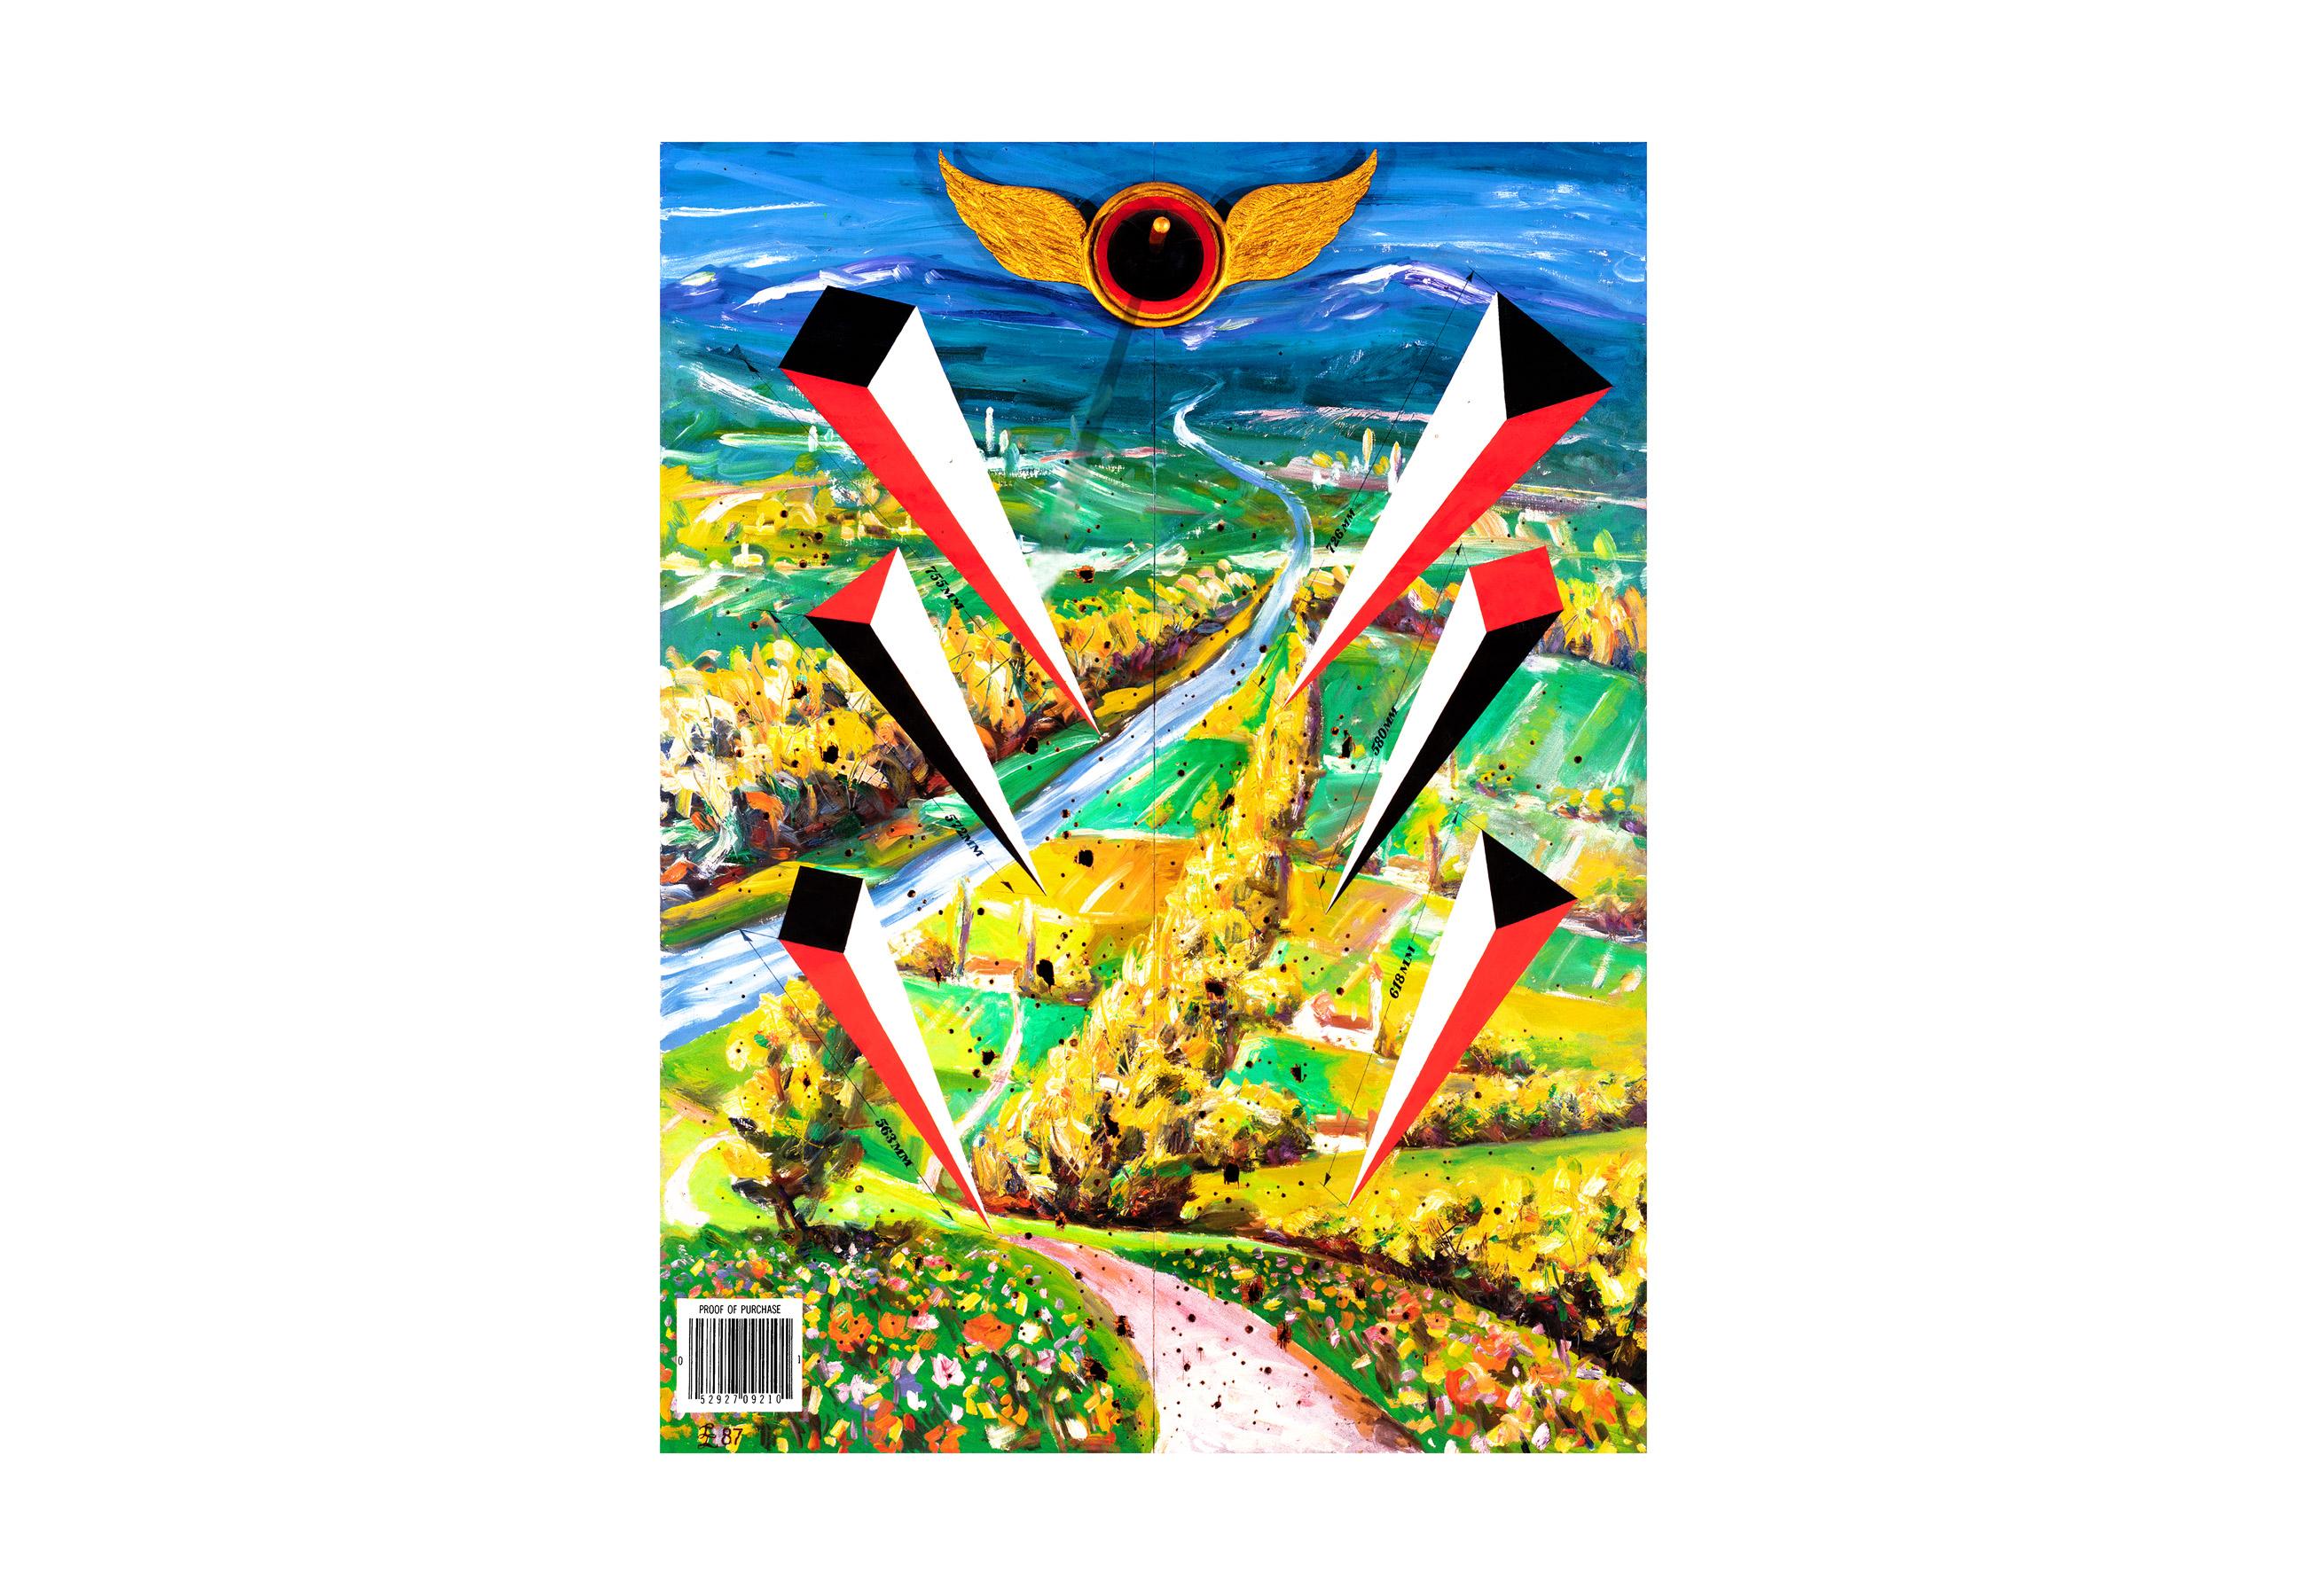 Lamm-Portfolio-1987-1990-1.jpg